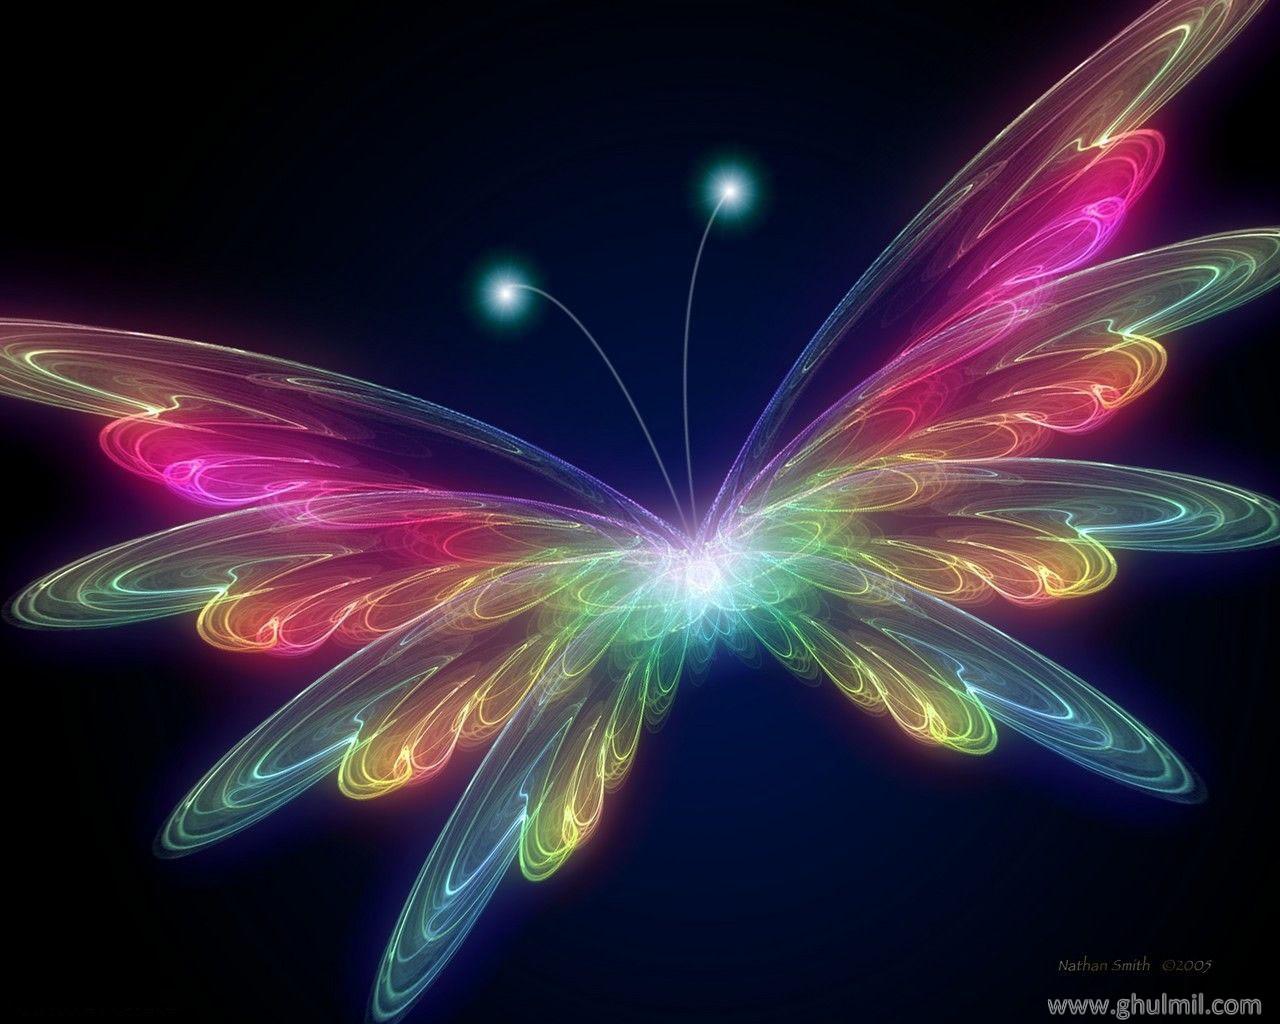 Digital Shine Butterfly - Digital Shine Butterfly